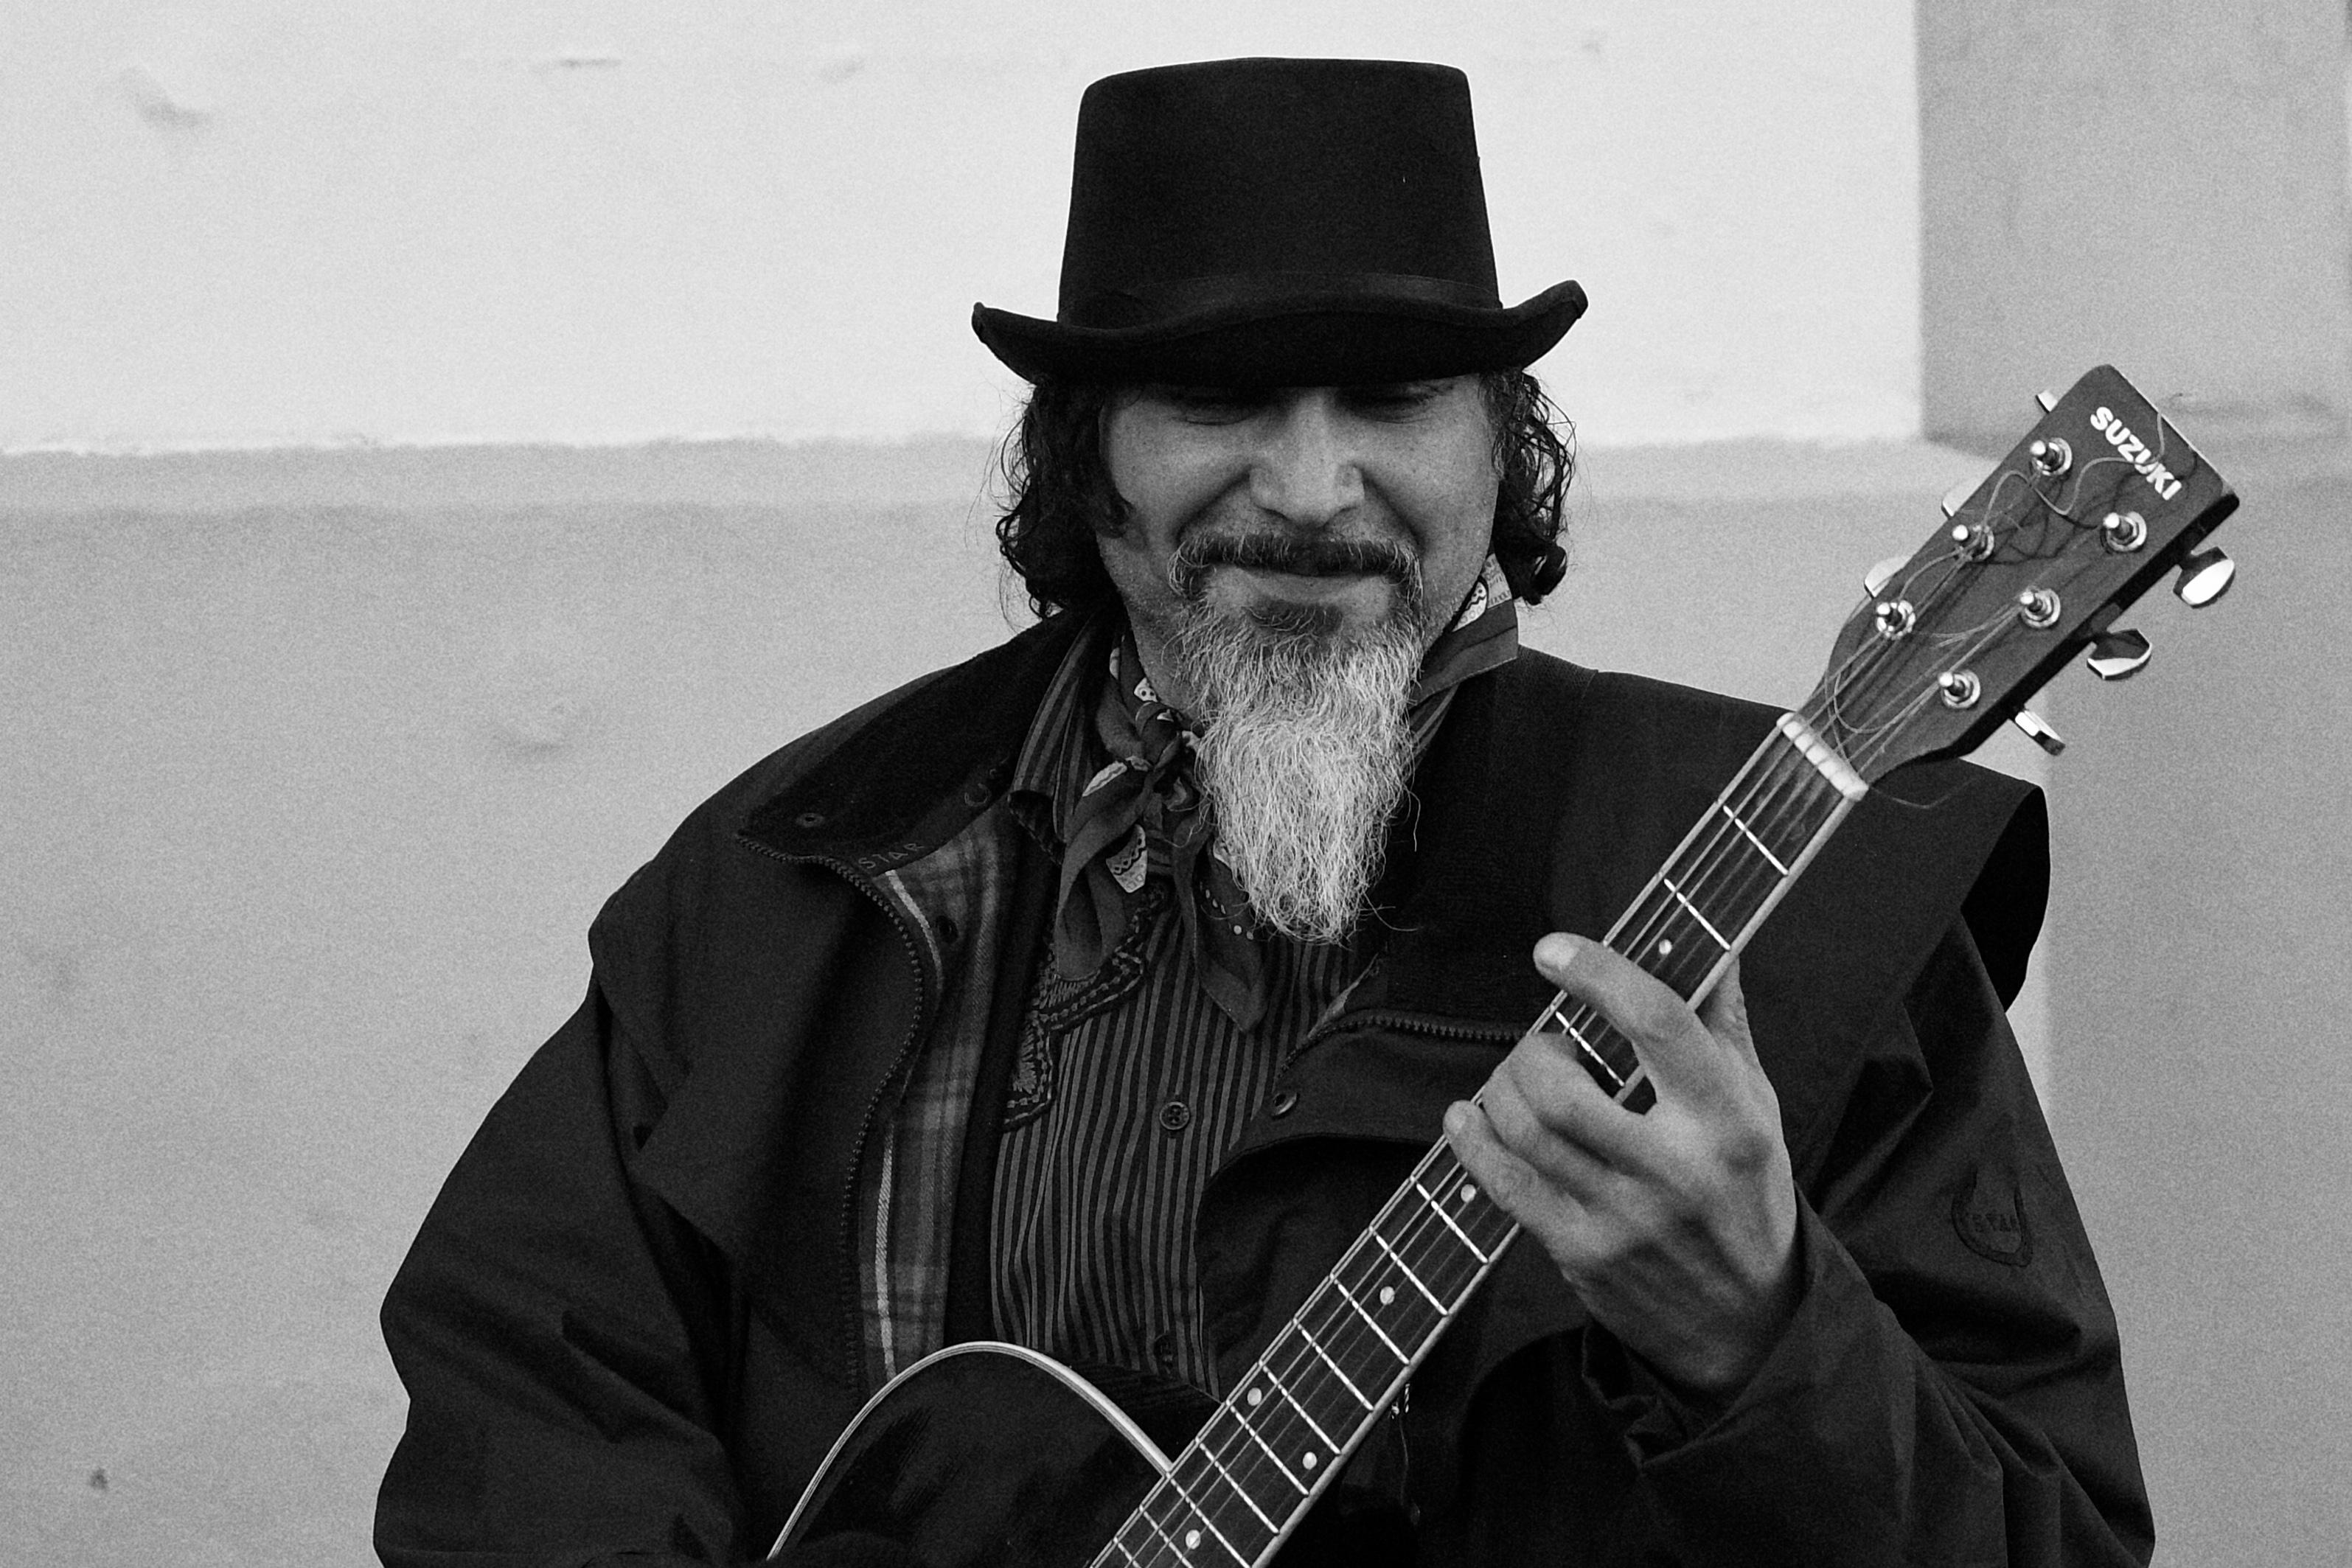 Street musician, Brussels 2016